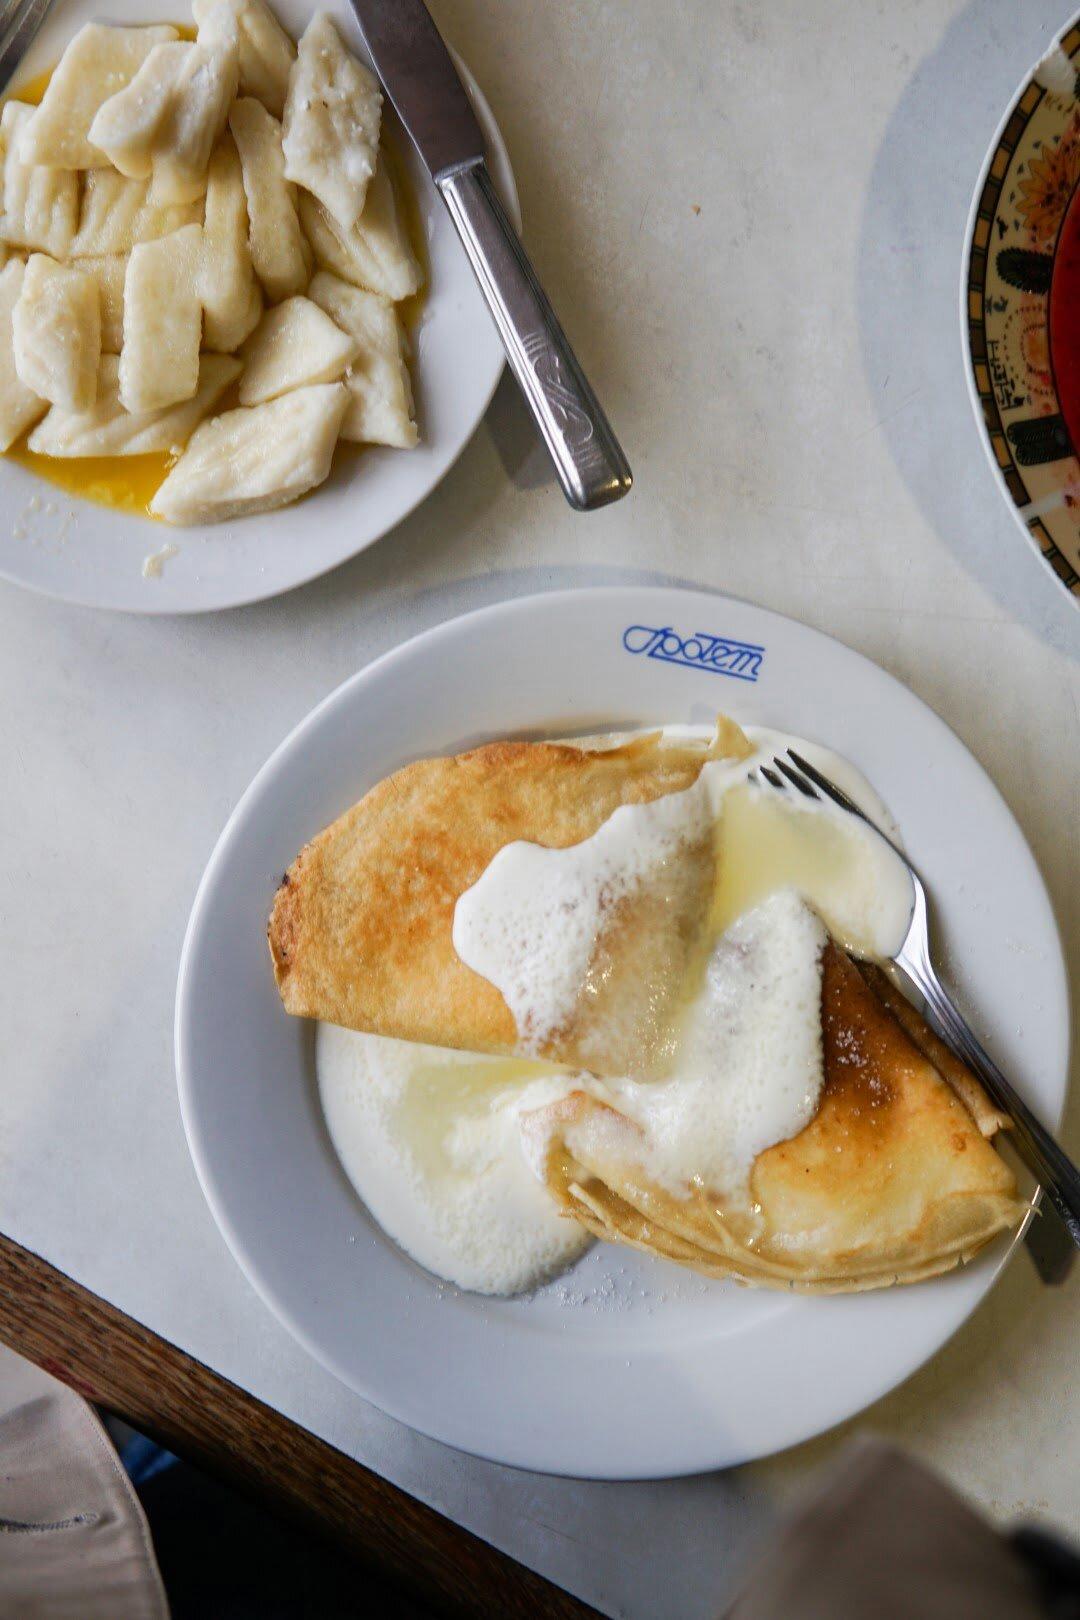 Bary mleczne. Dieta reżimowa - Realia PRL-u a Kuchnia Polska. Część V 6